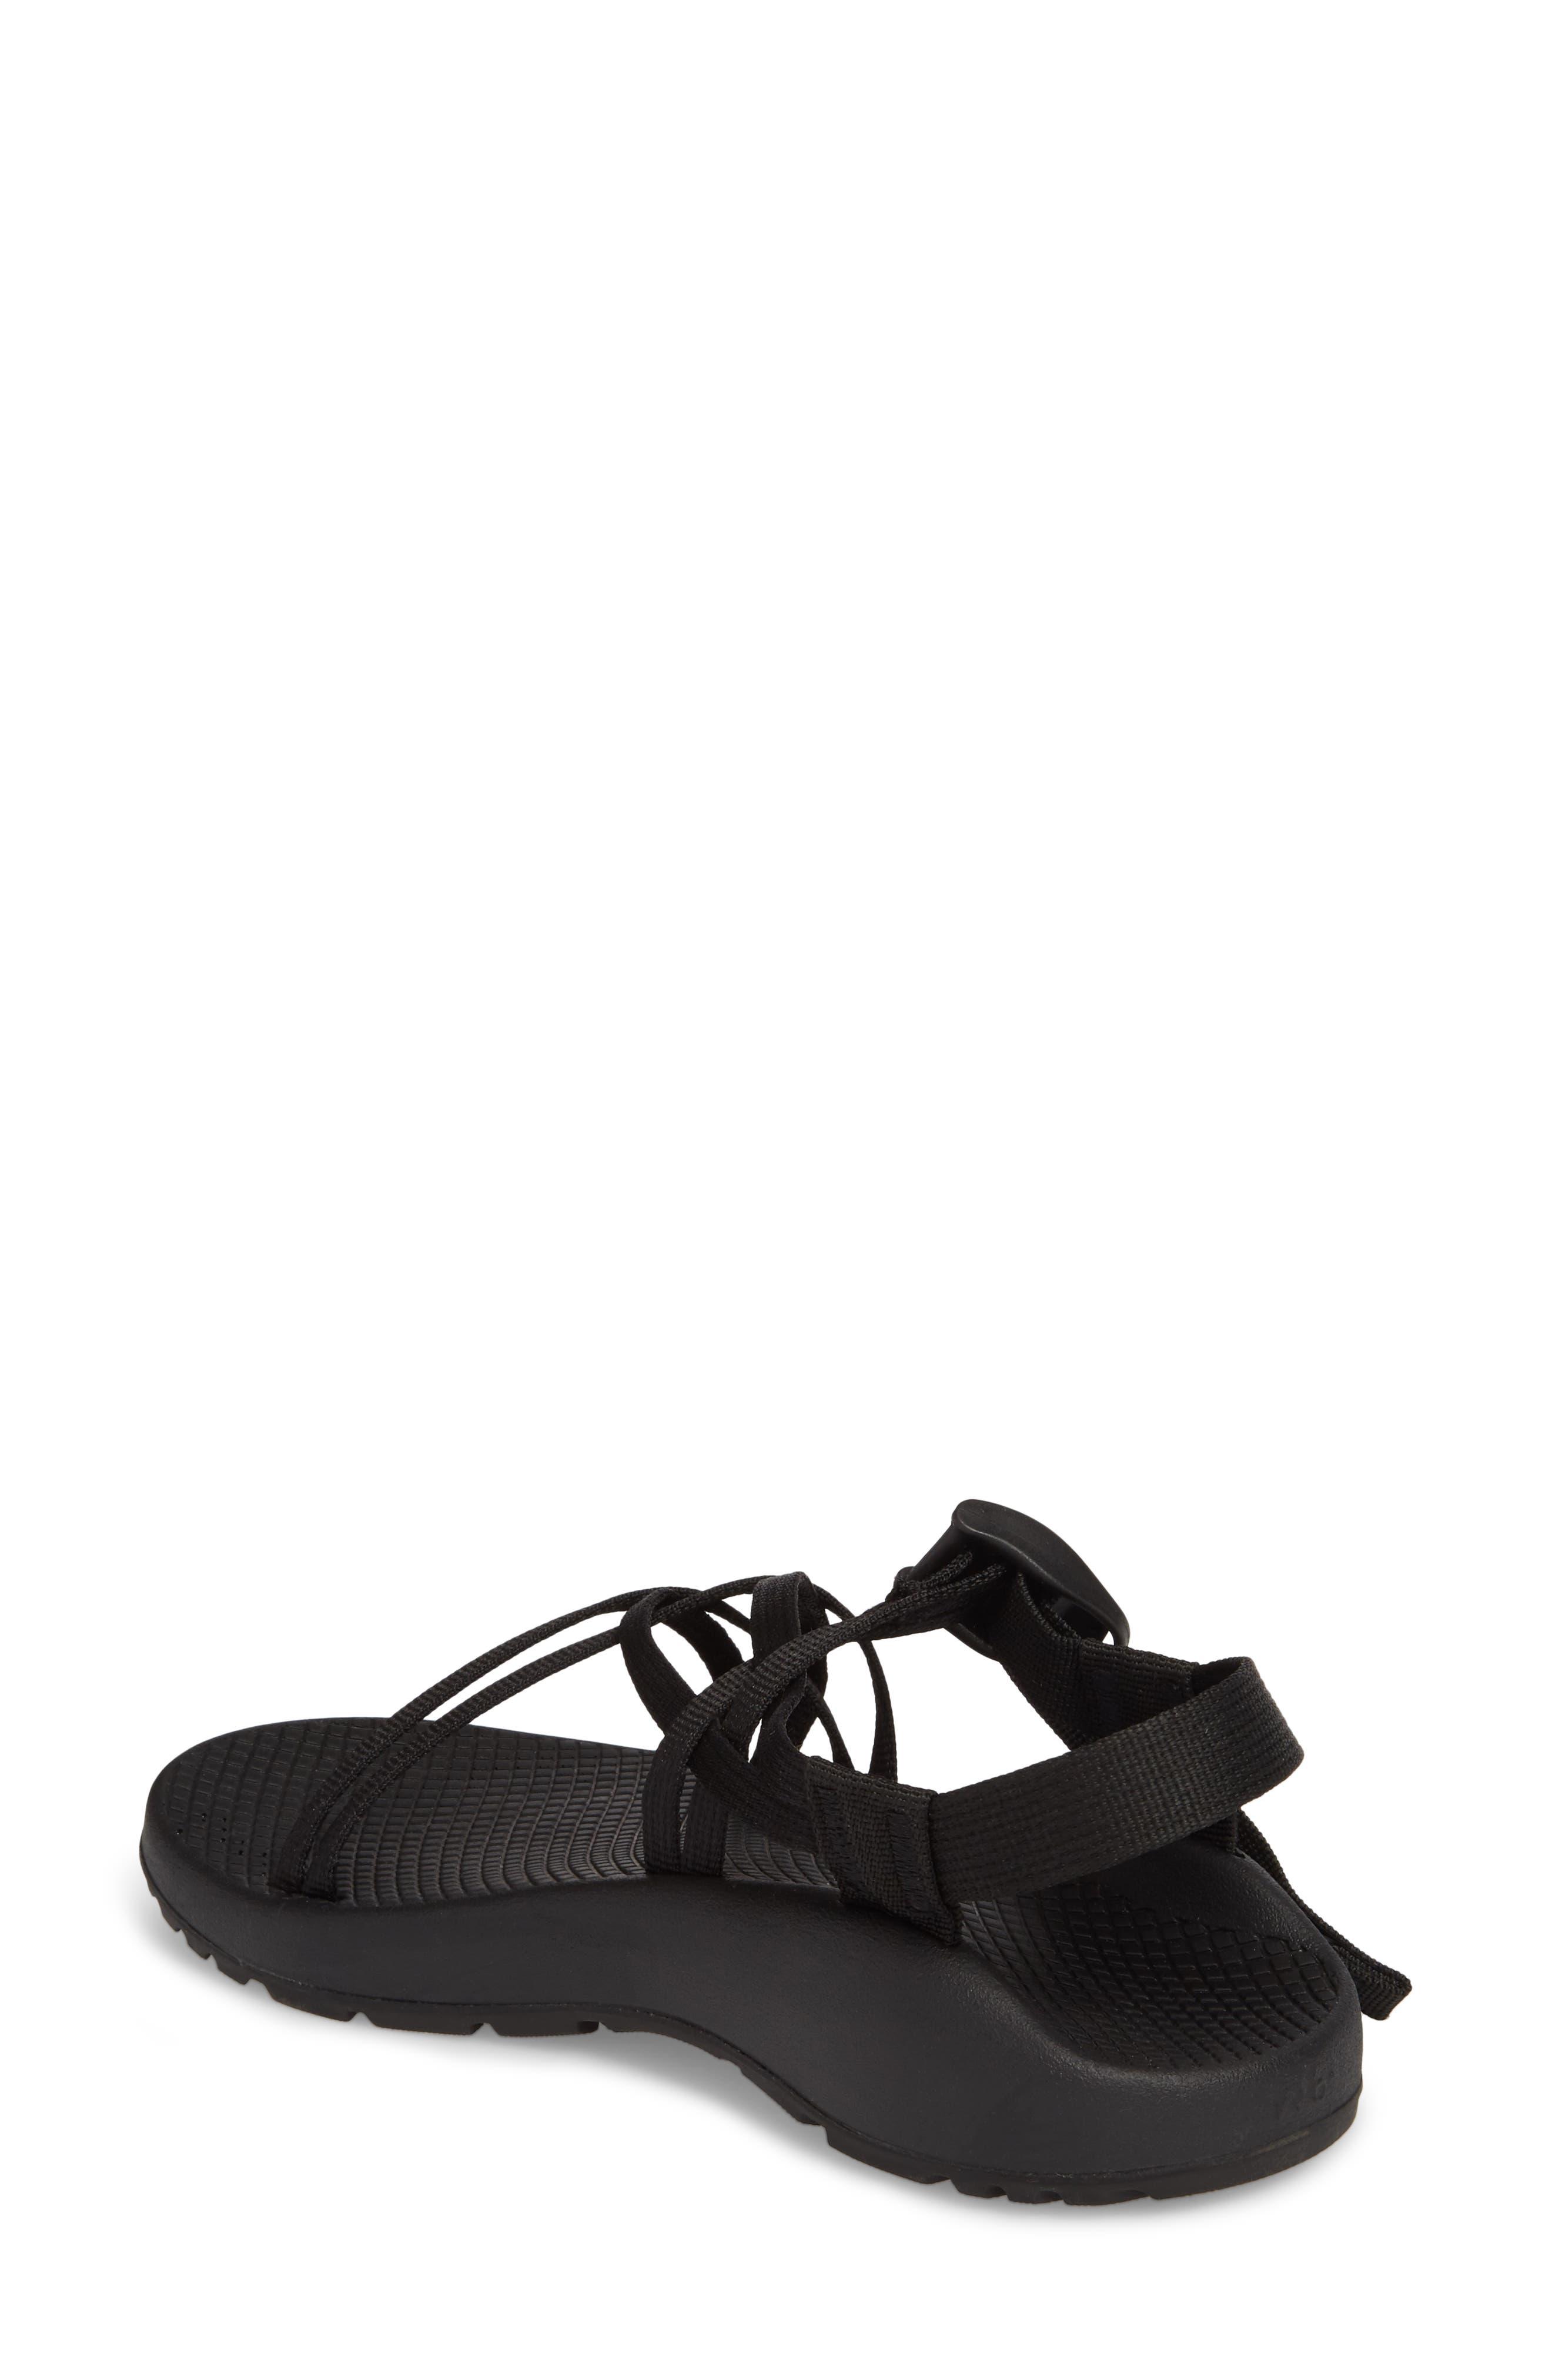 ZX1 Classic Sport Sandal,                             Alternate thumbnail 2, color,                             BLACK